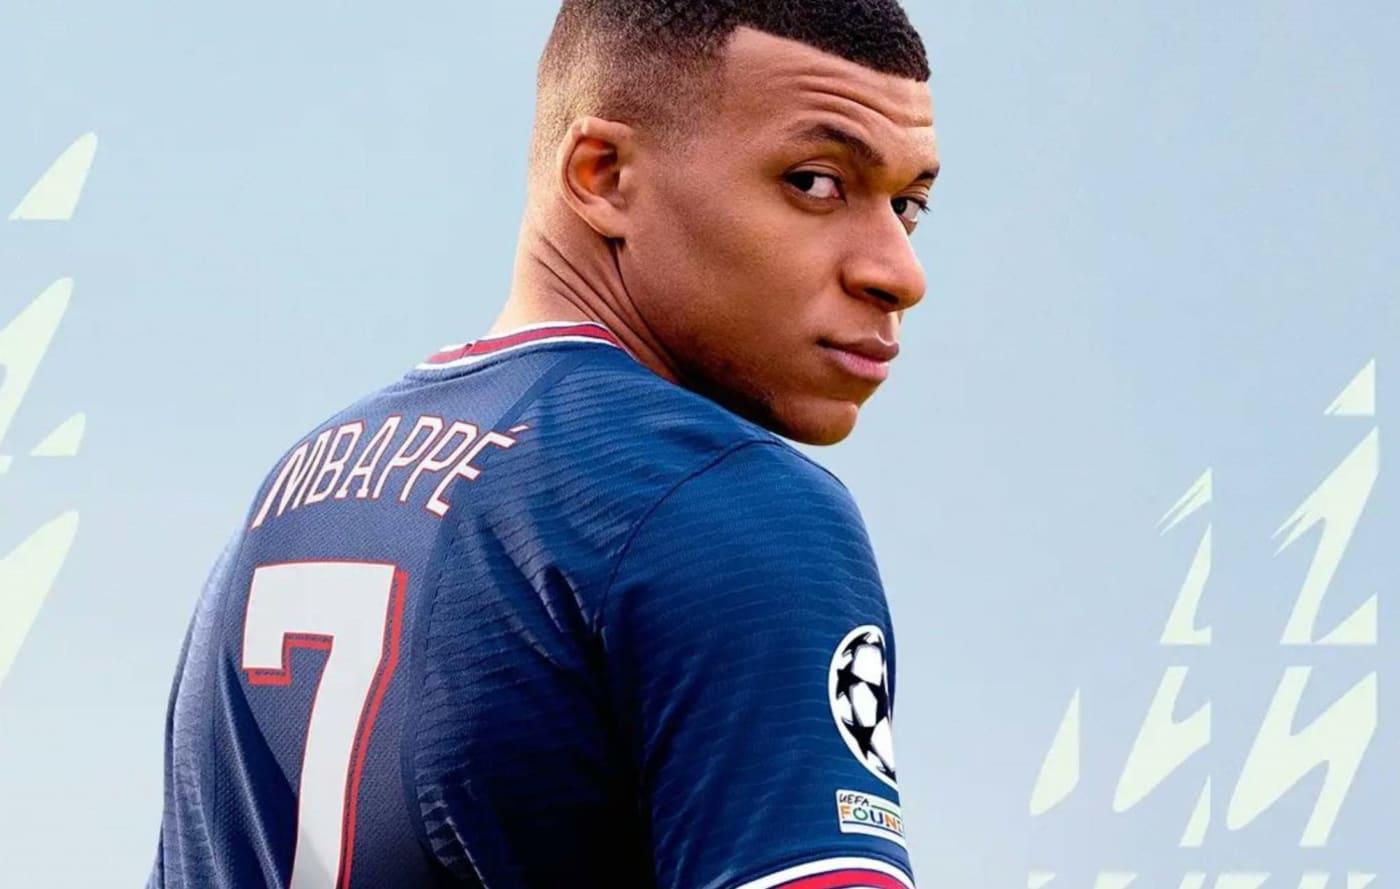 FIFA 22 credit: Twitter